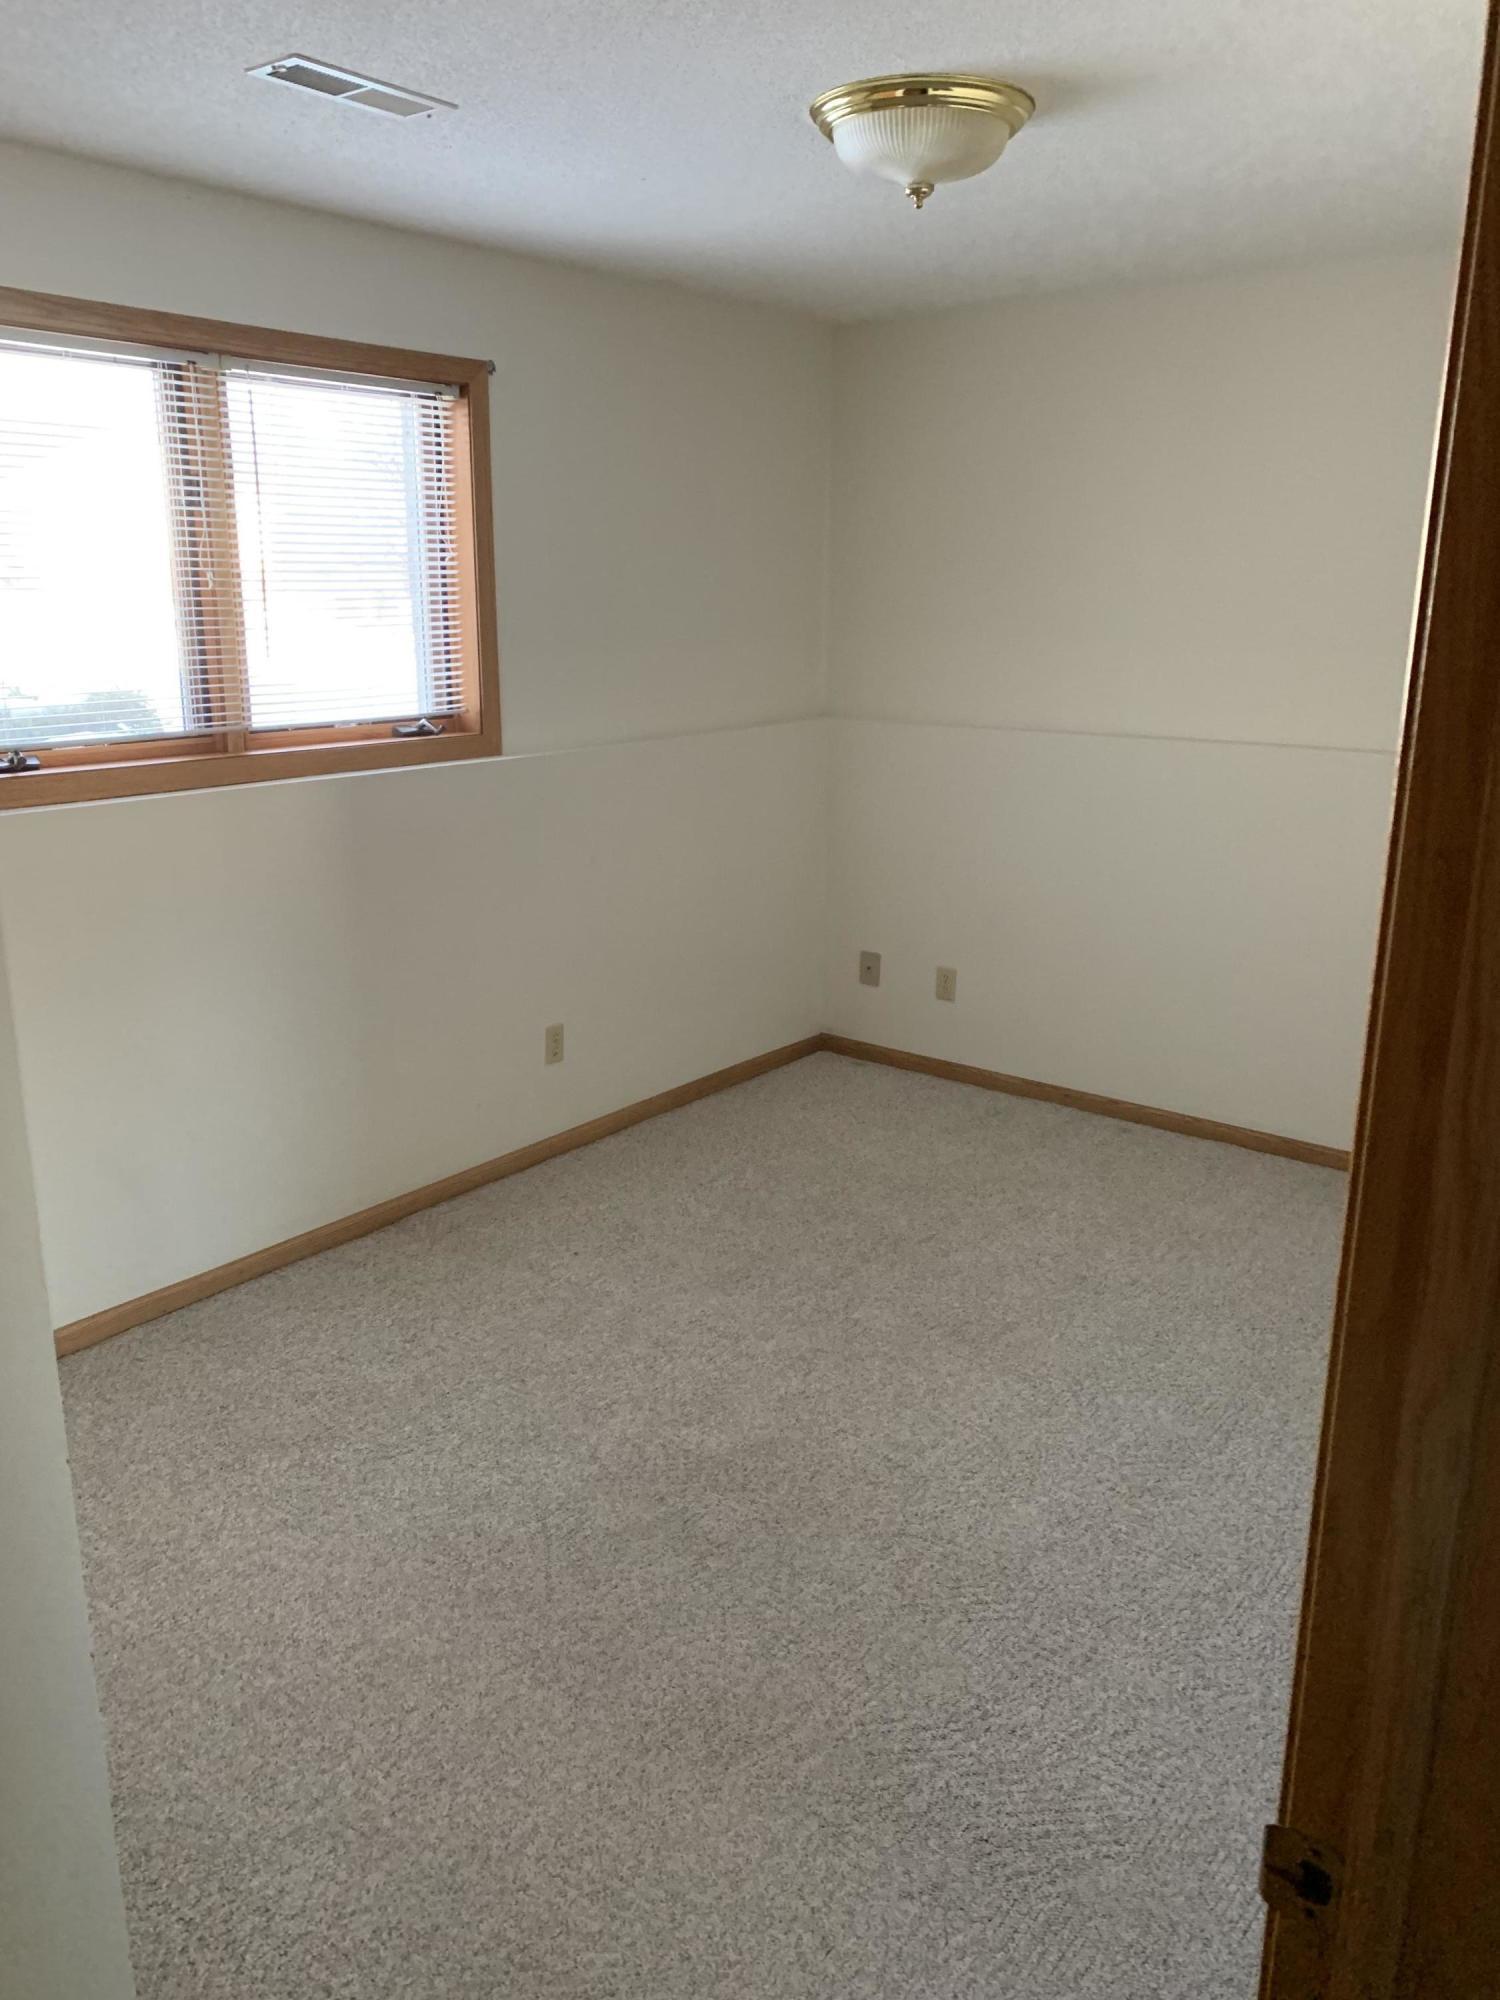 135-137 Rhyme St<br /> West Salem,La Crosse,54669,3 Bedrooms Bedrooms,1 BathroomBathrooms,Two-family,Rhyme St,1617788